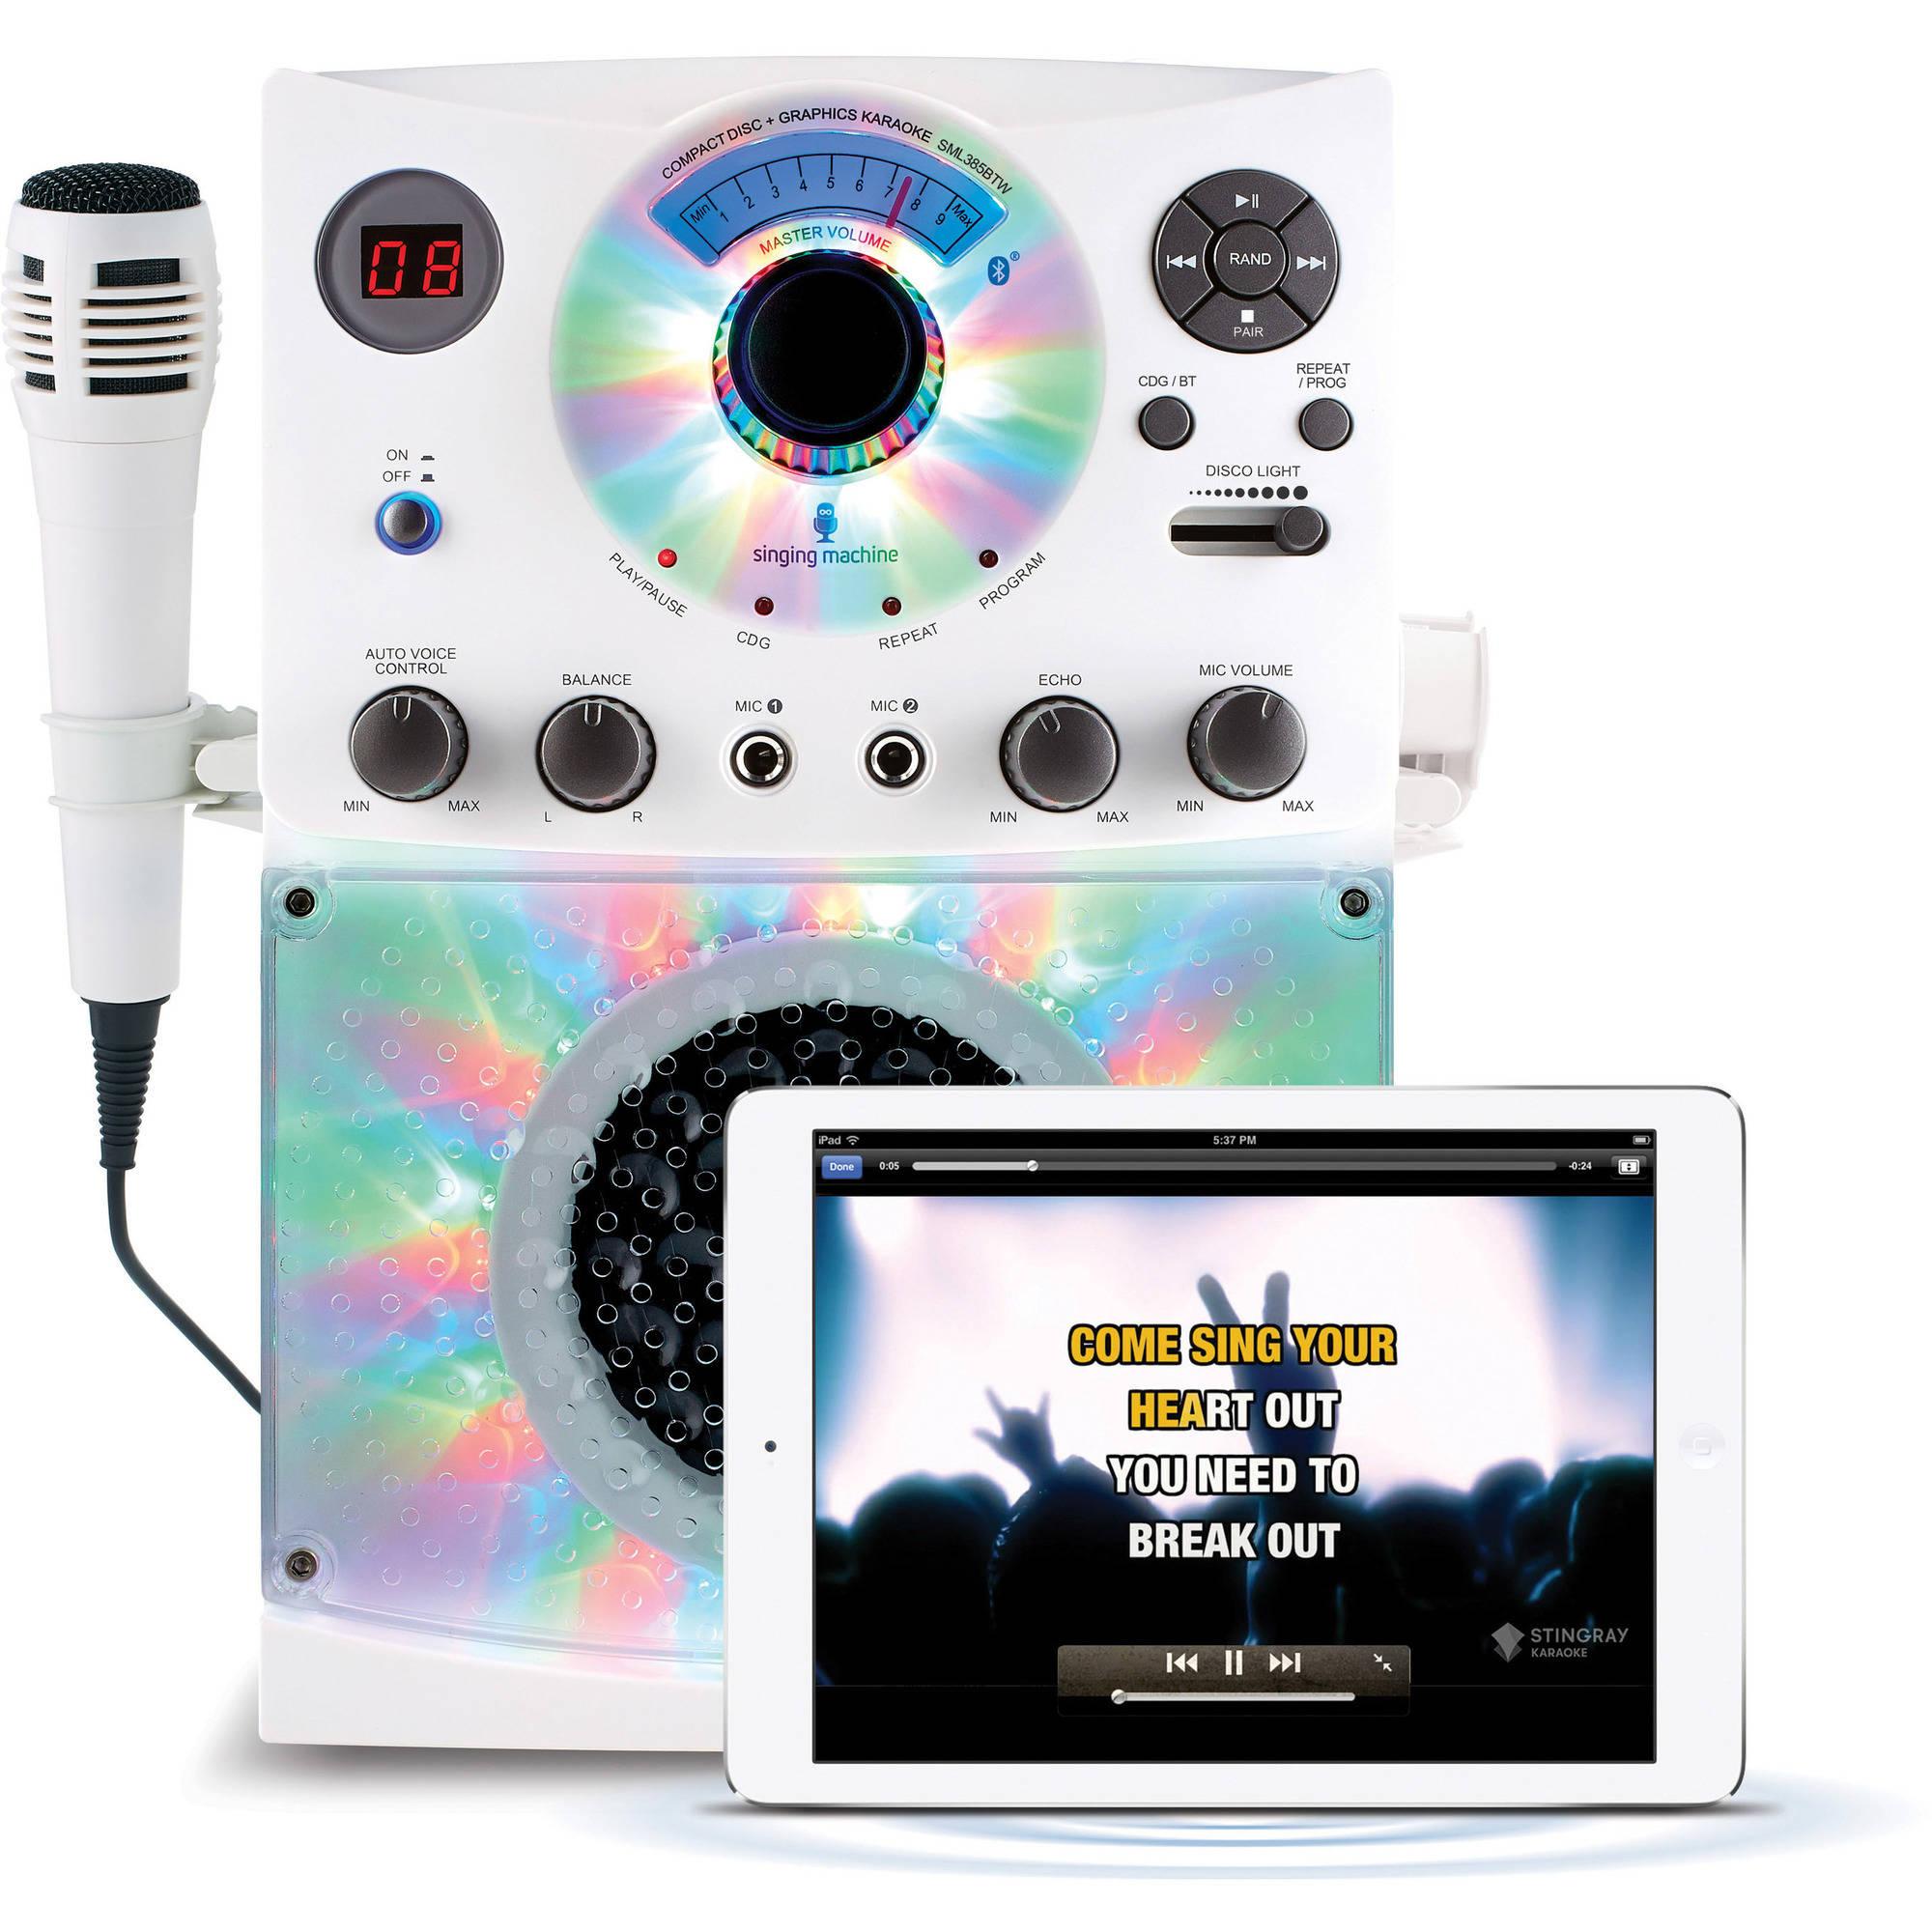 Singer clipart karaoke machine Karaoke Free Download Cliparts Art